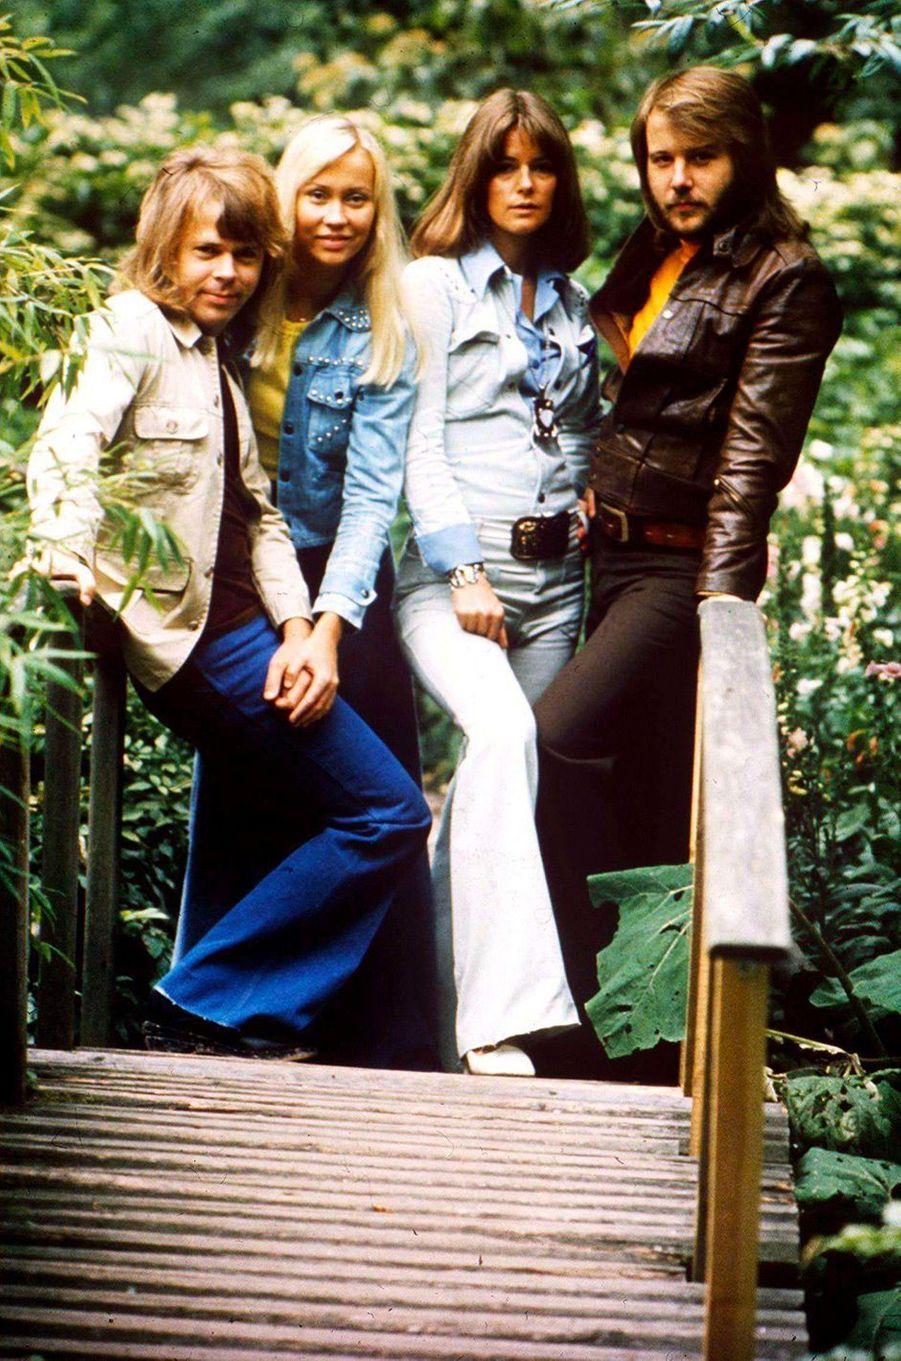 Le groupe ABBA en 1975